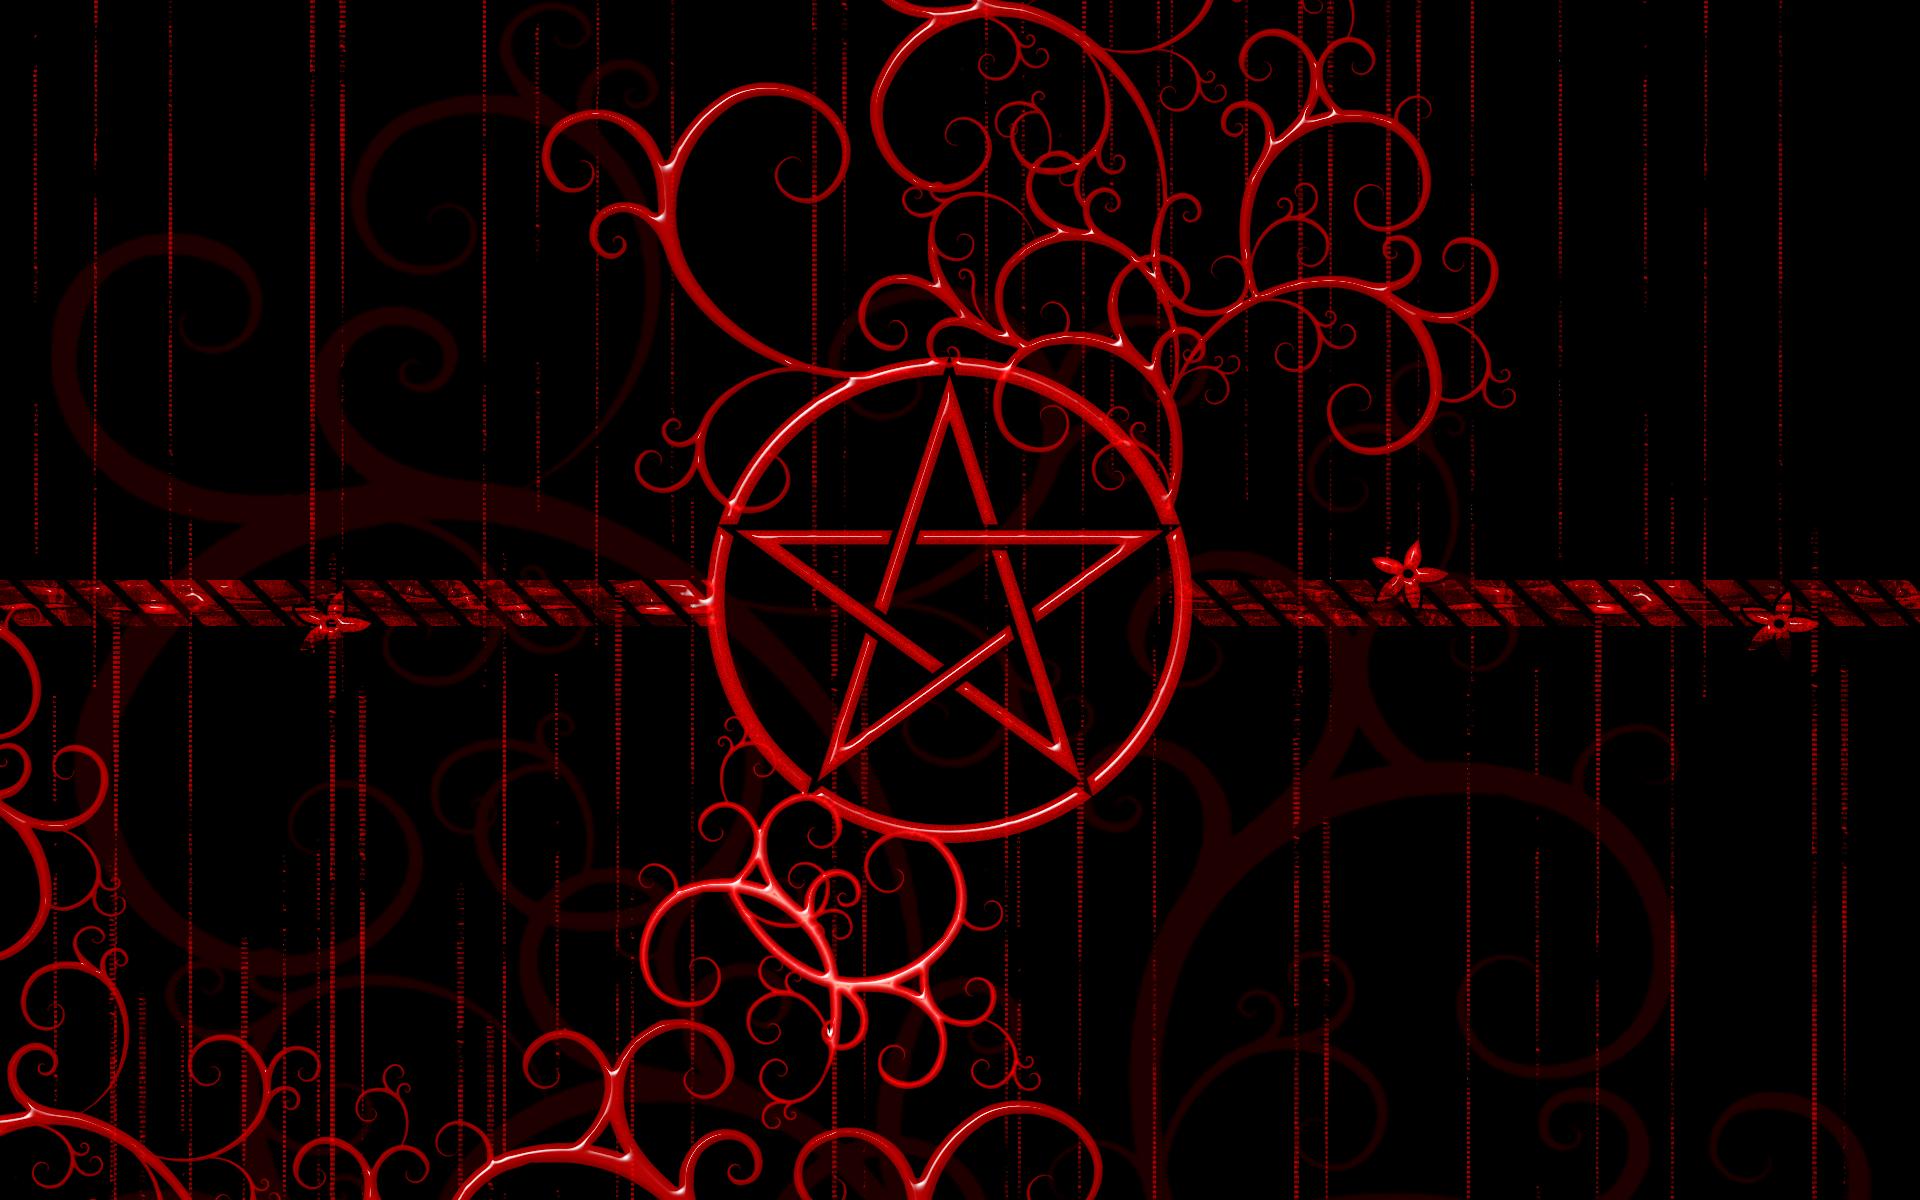 Satan wallpapers wallpaperup epic car wallpapers pinterest abstract satan pentagram hd wallpaper on mobdecor voltagebd Image collections